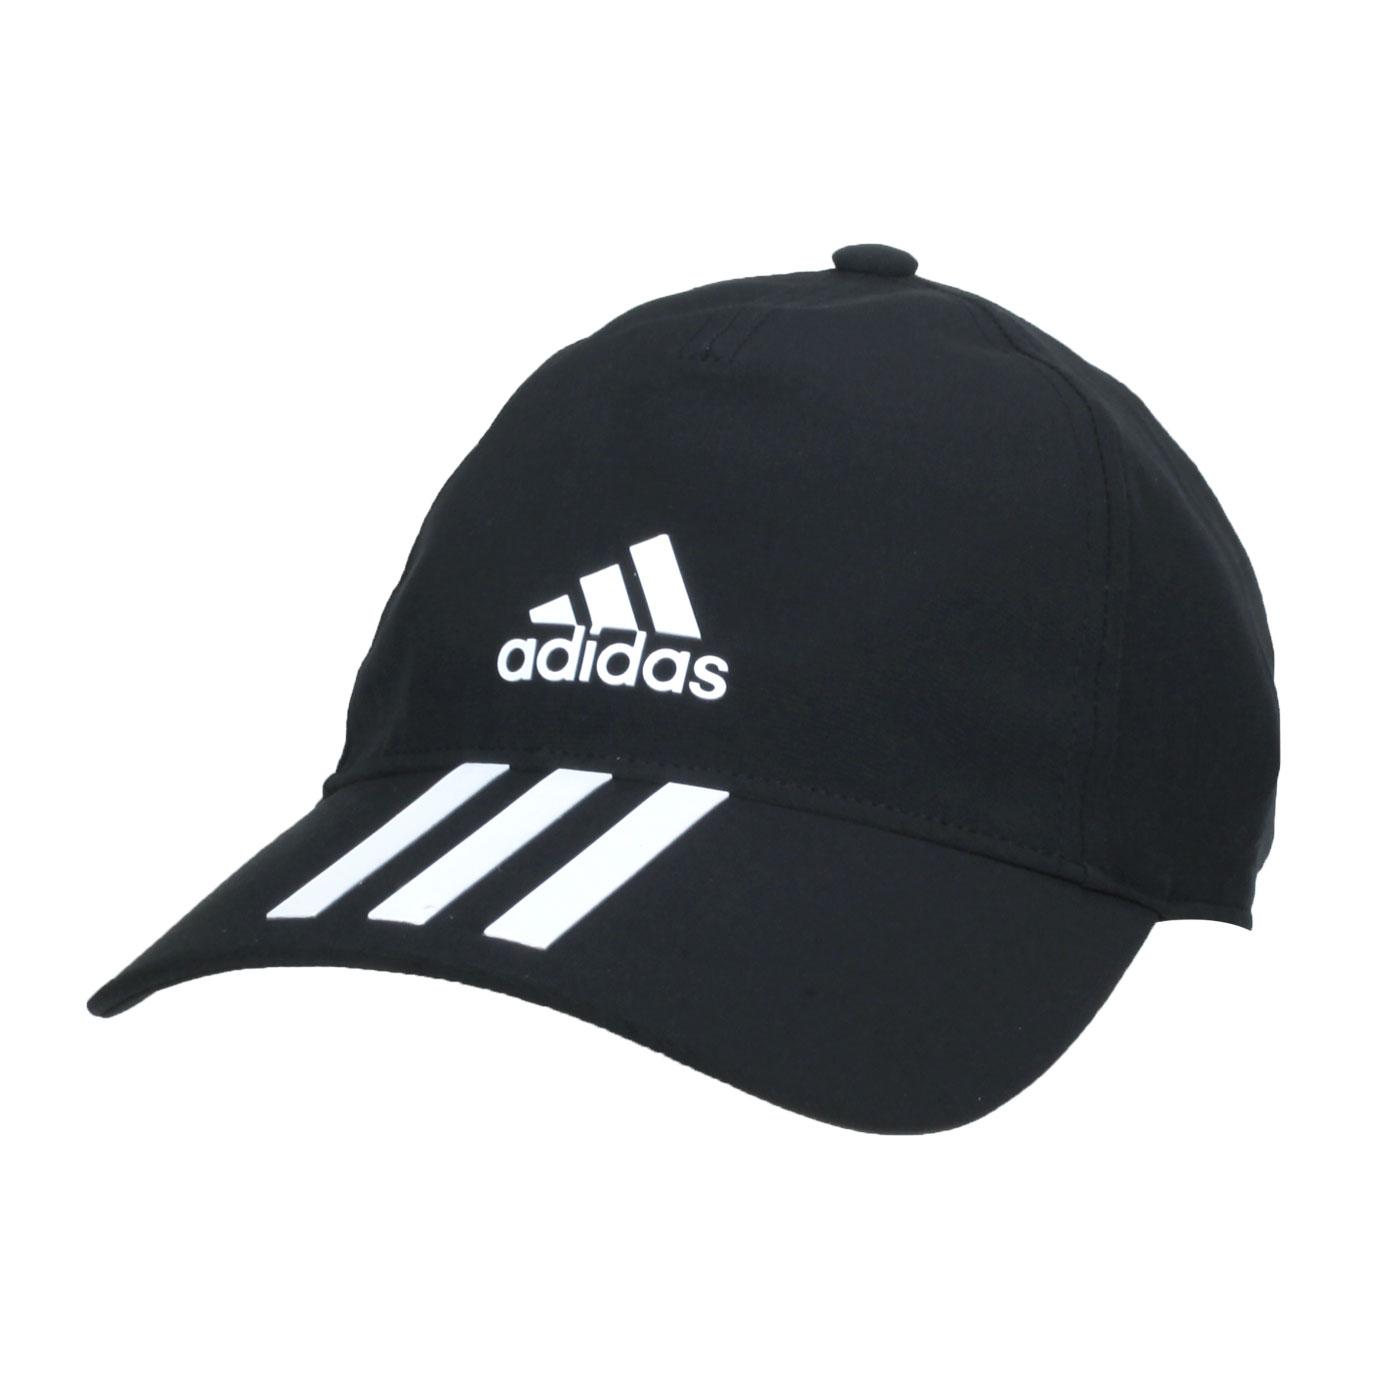 ADIDAS 帽子 GM6278